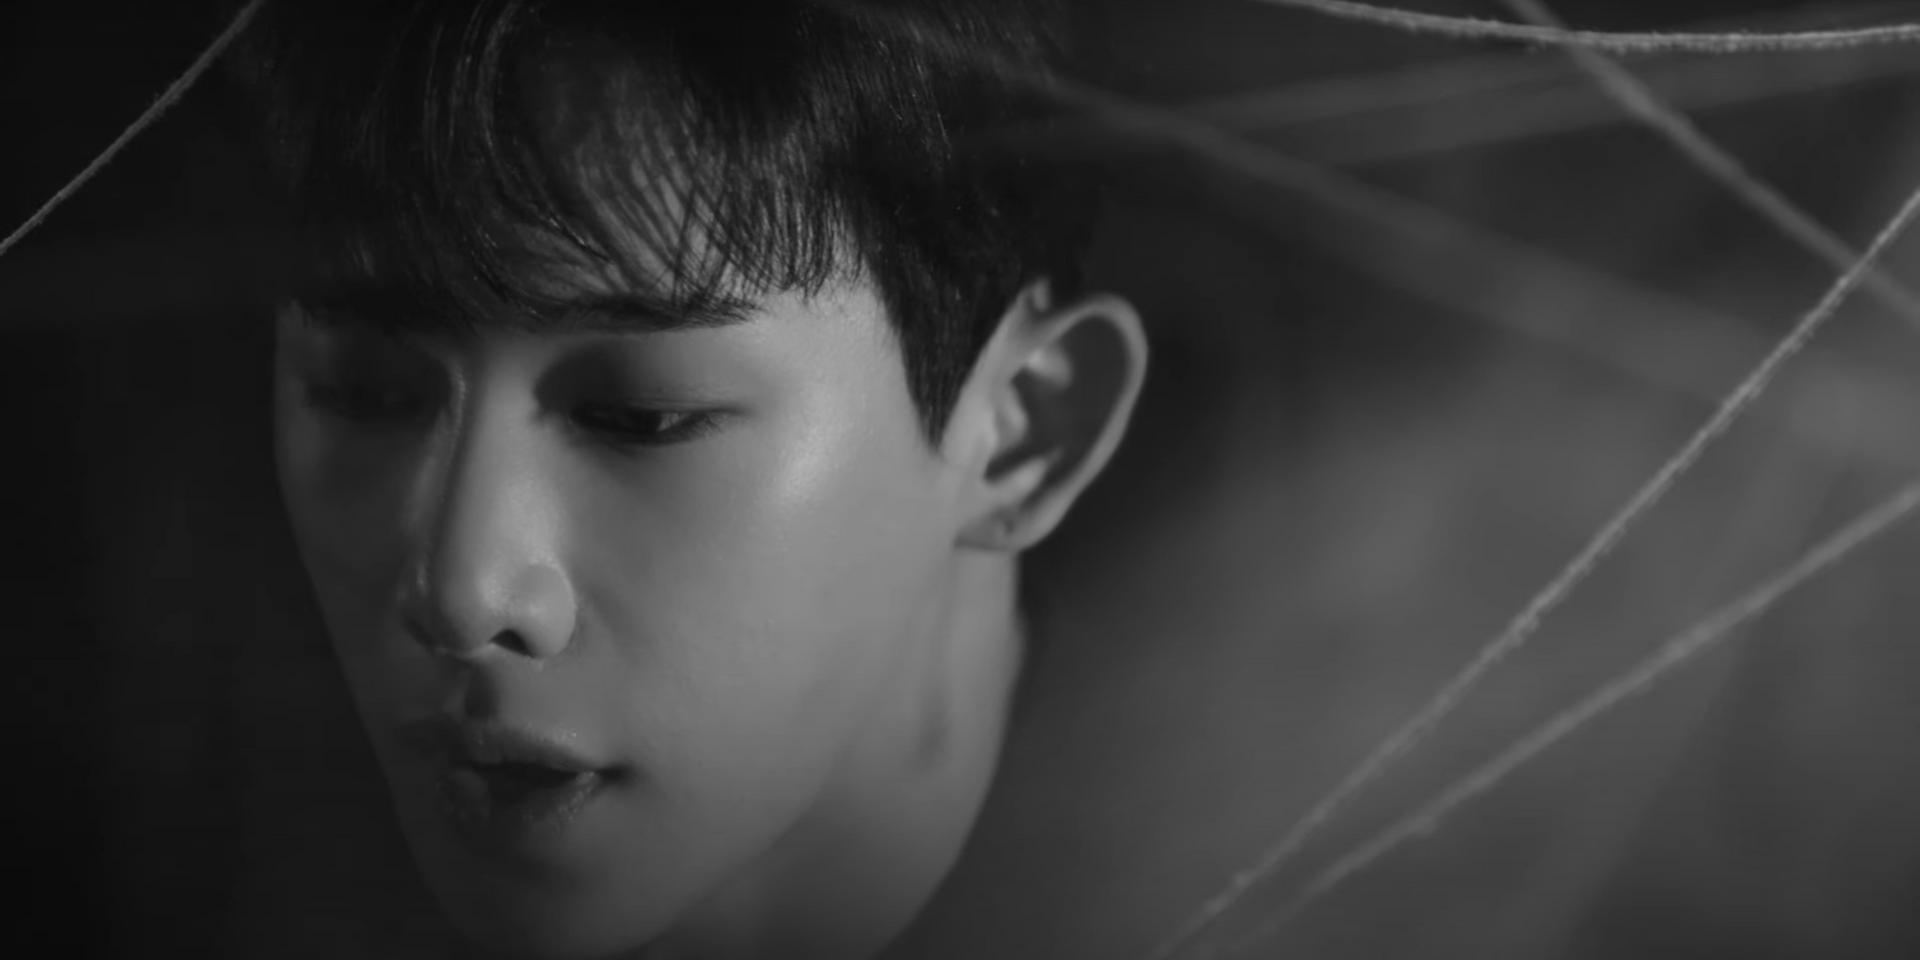 Wonho dedicates emotional solo debut 'Losing You' to fans – watch